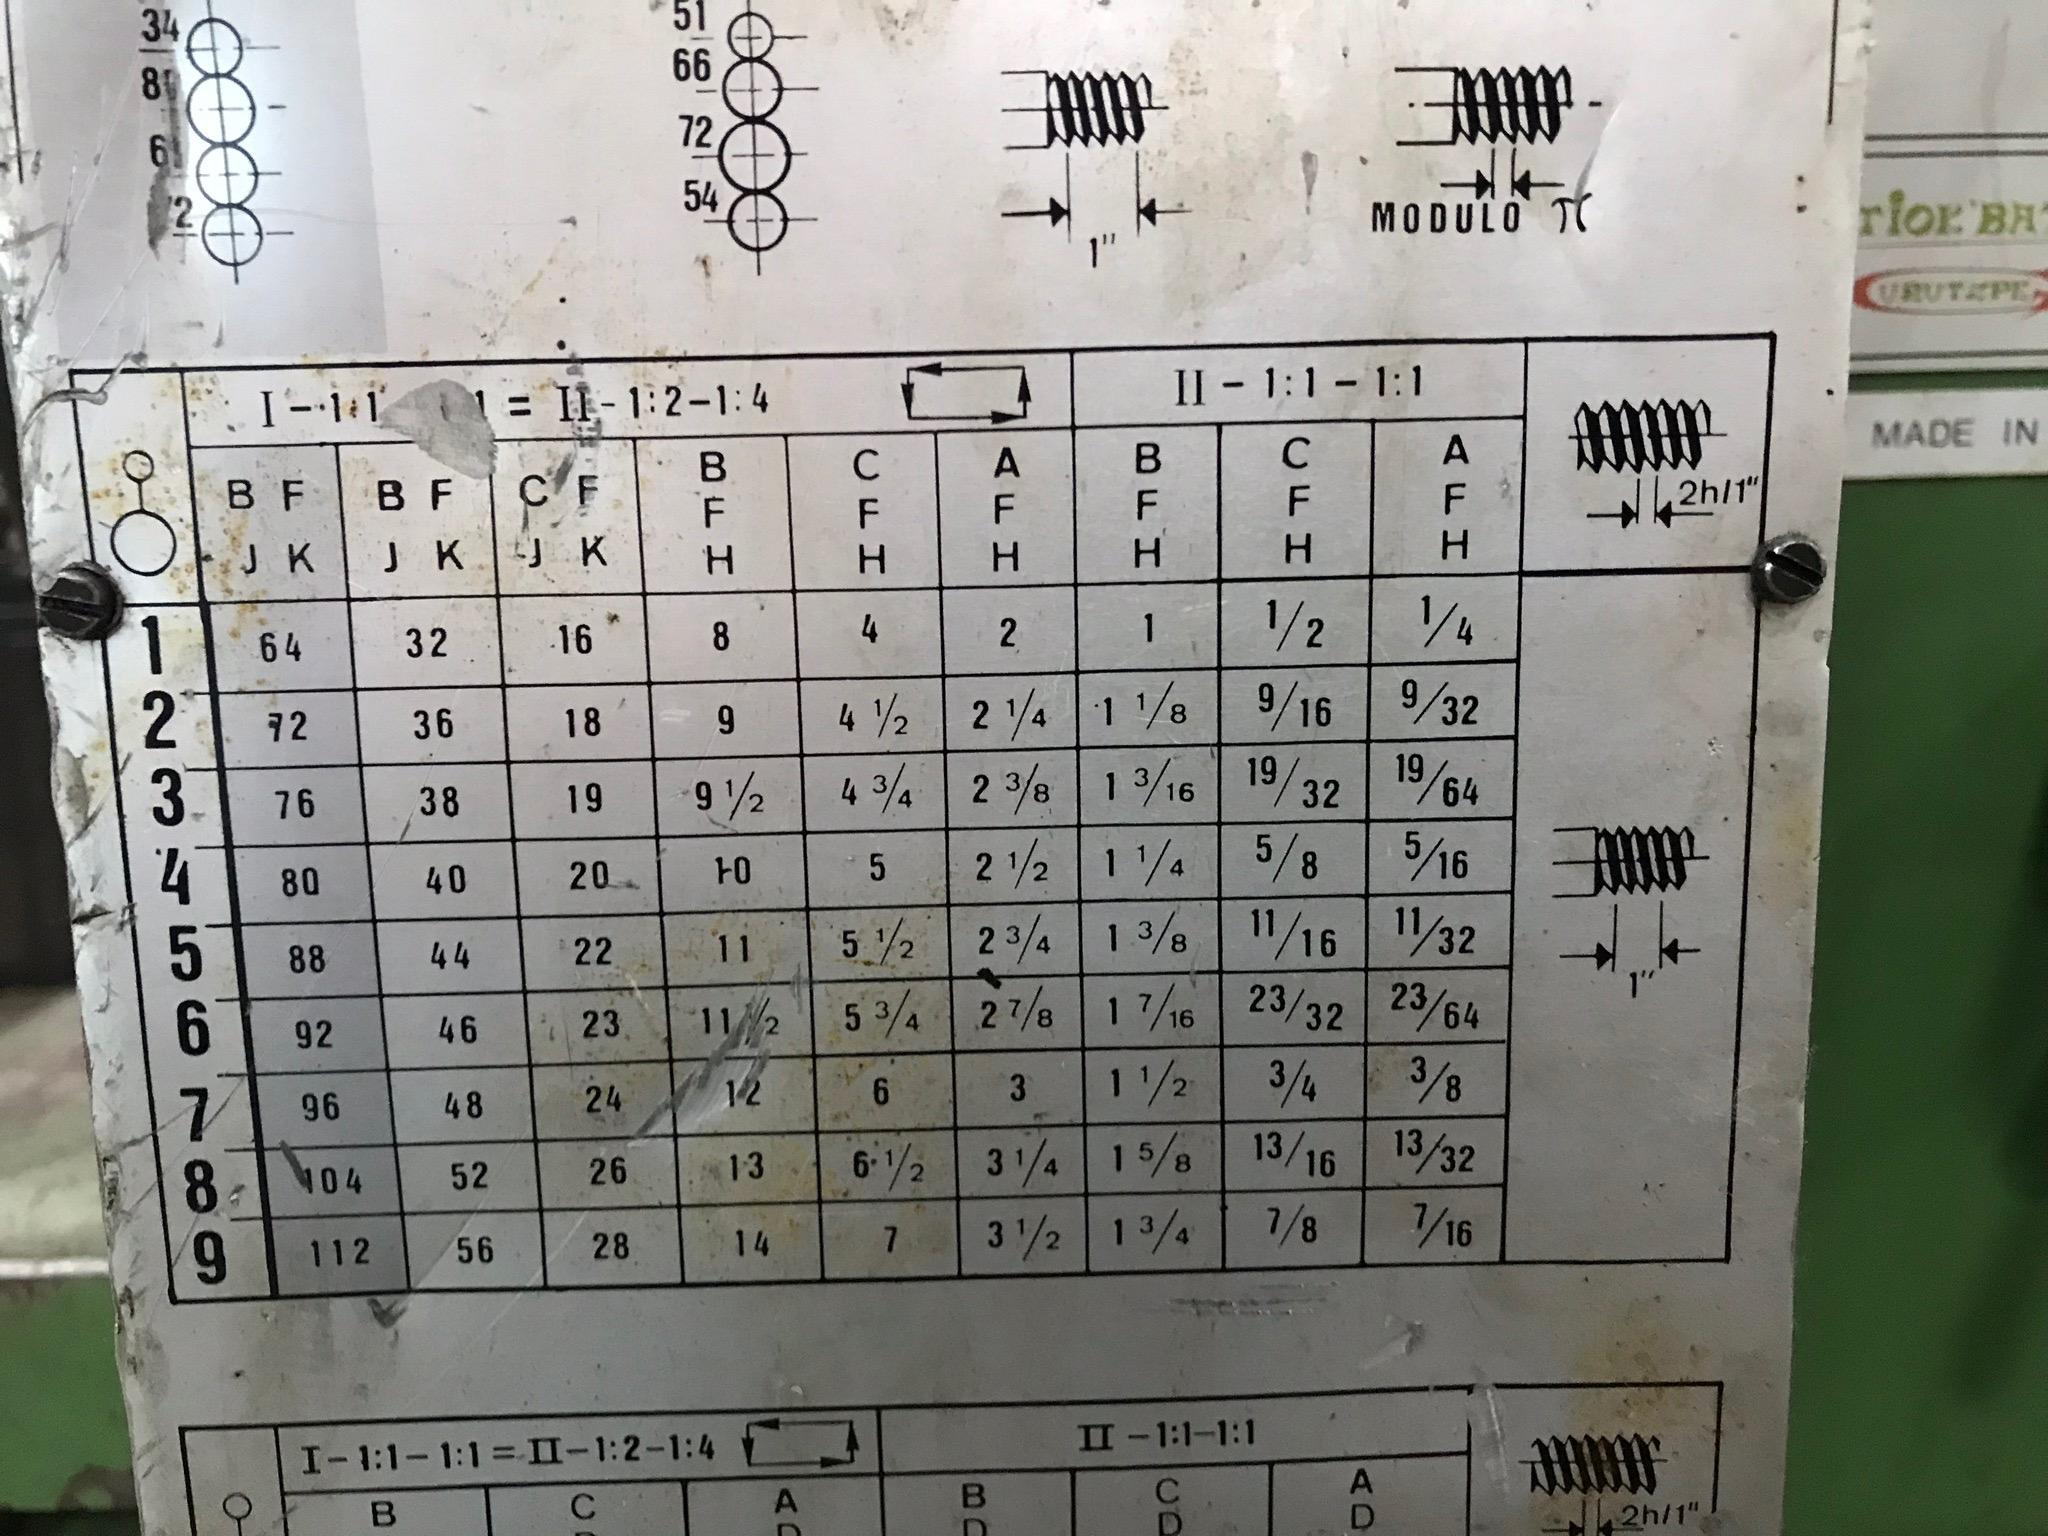 "32"" X 120"" TIMEMASTER / GURUTZPE OIL COUNTRY ENGINE LATHE, 10"" HOLE, F & R 10"" HOLE CHUCKS, 500 RPM, RAPIDS, 32"" GAP, 19"" OC,  TAPER, AUTO THREADING, NICE!, 1982"